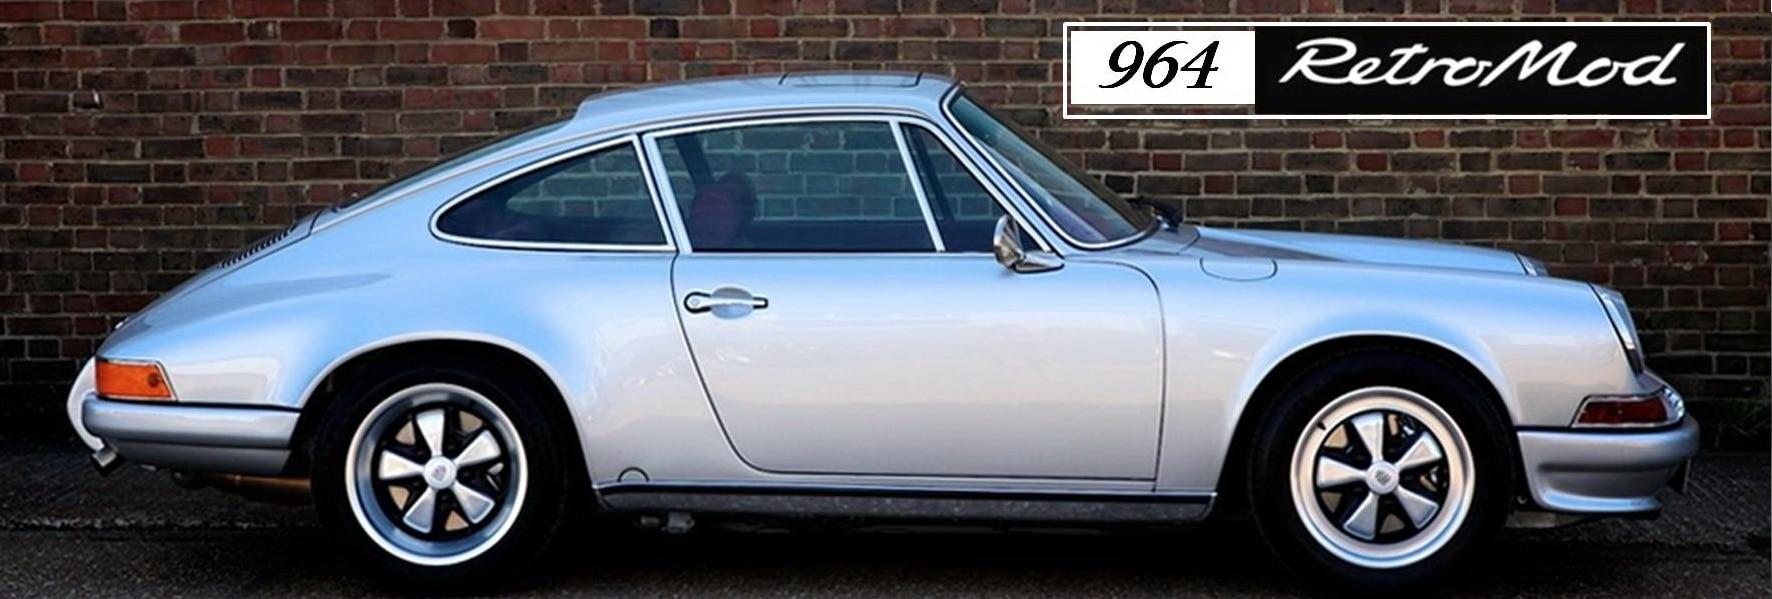 964 retromod banner 10